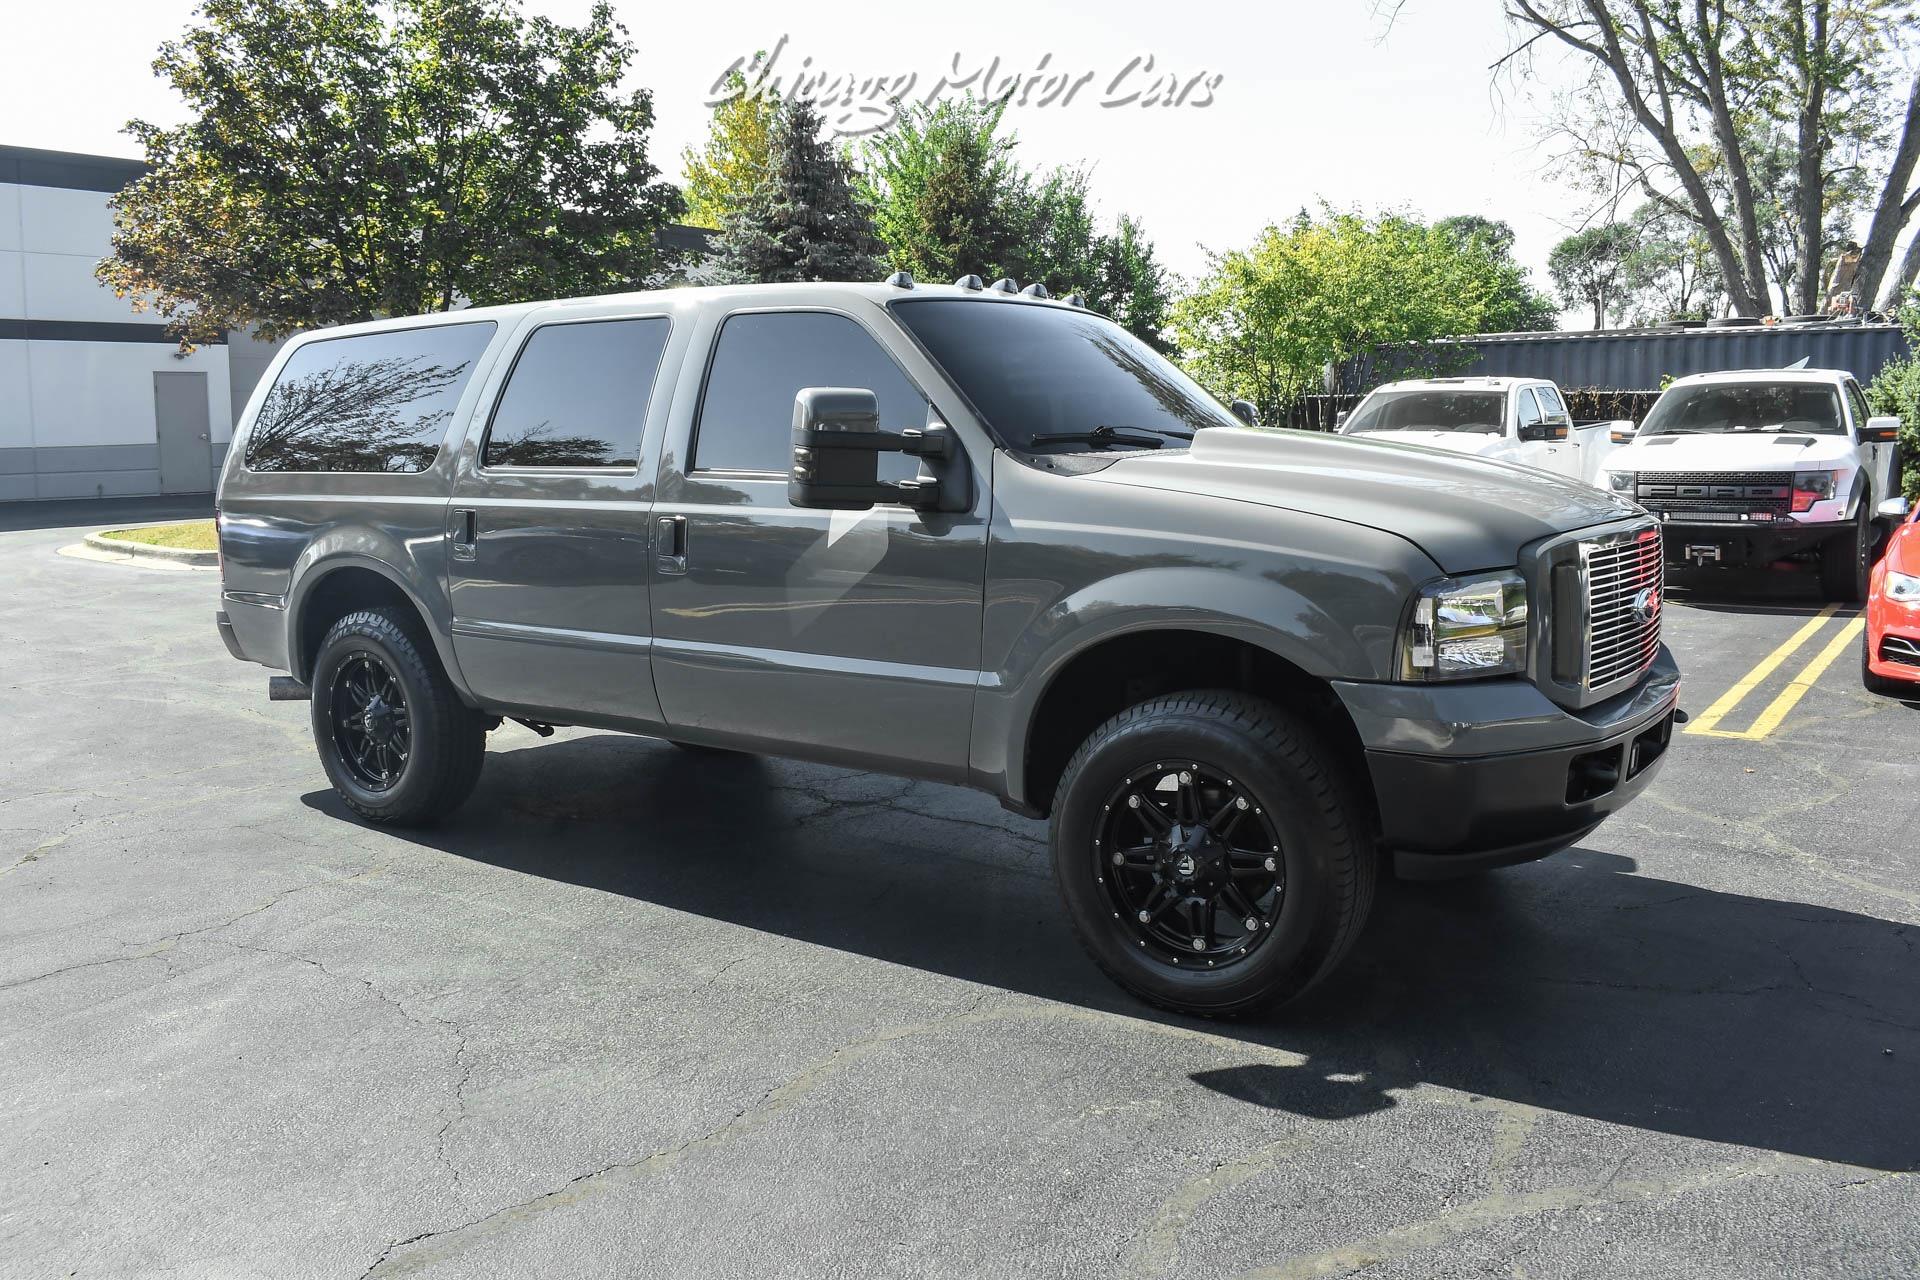 Used-2003-Ford-Excursion-Eddie-Bauer-Edition-60-L-Diesel-Conversion-4X4